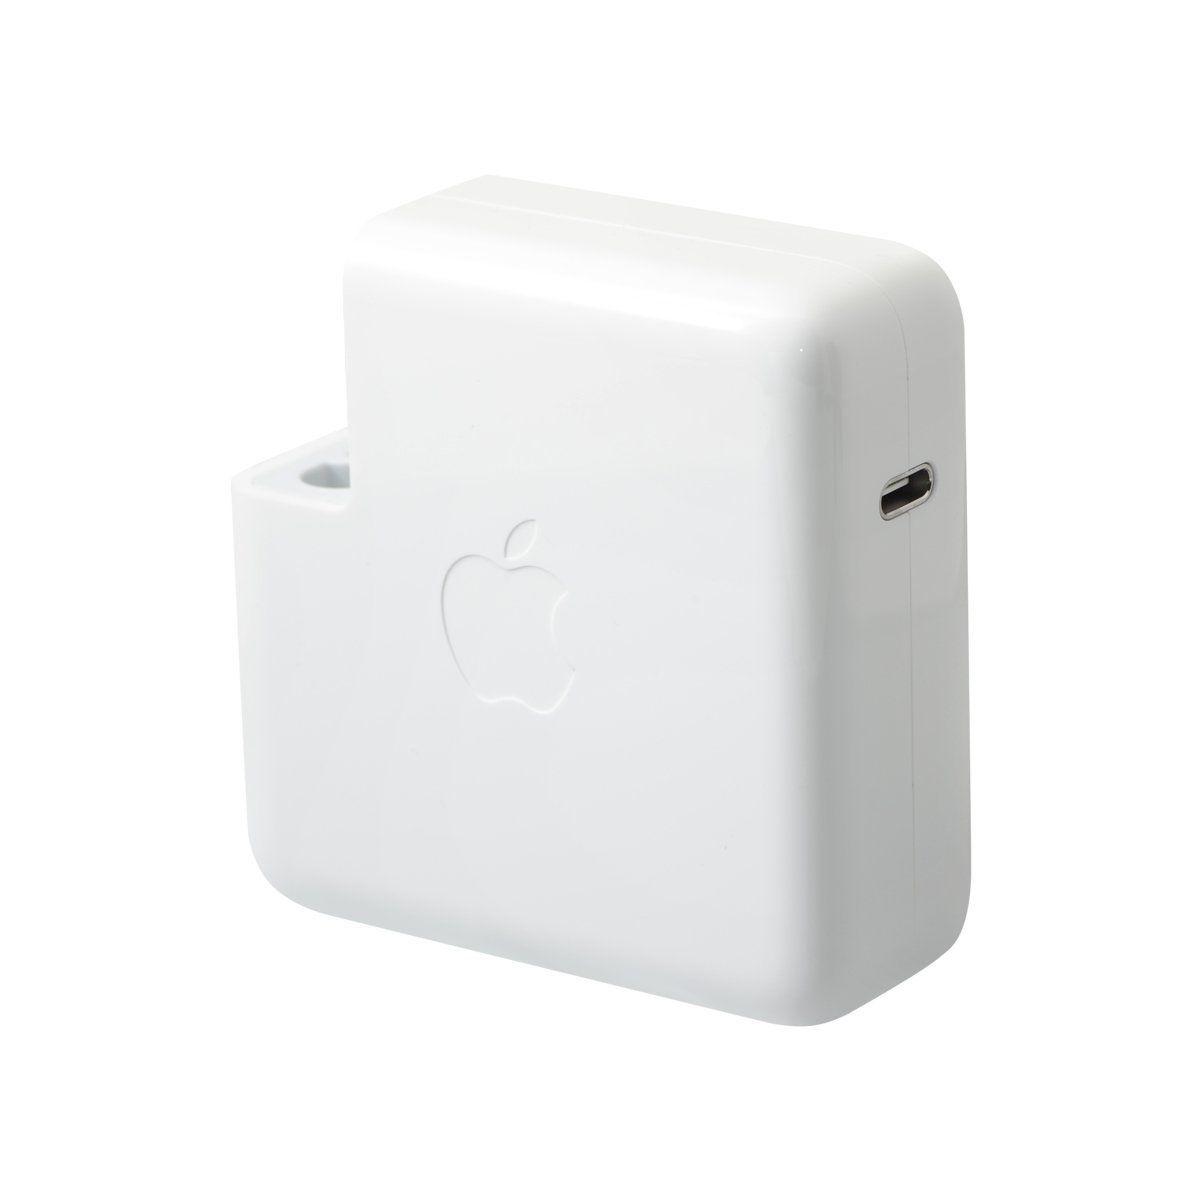 "Incarcator original Apple A1719 87W USB-C pentru MacBook Pro 15"" (2017) Touch Bar A1707 (Retina, Mid 2017) (Retina, Late 2016)"